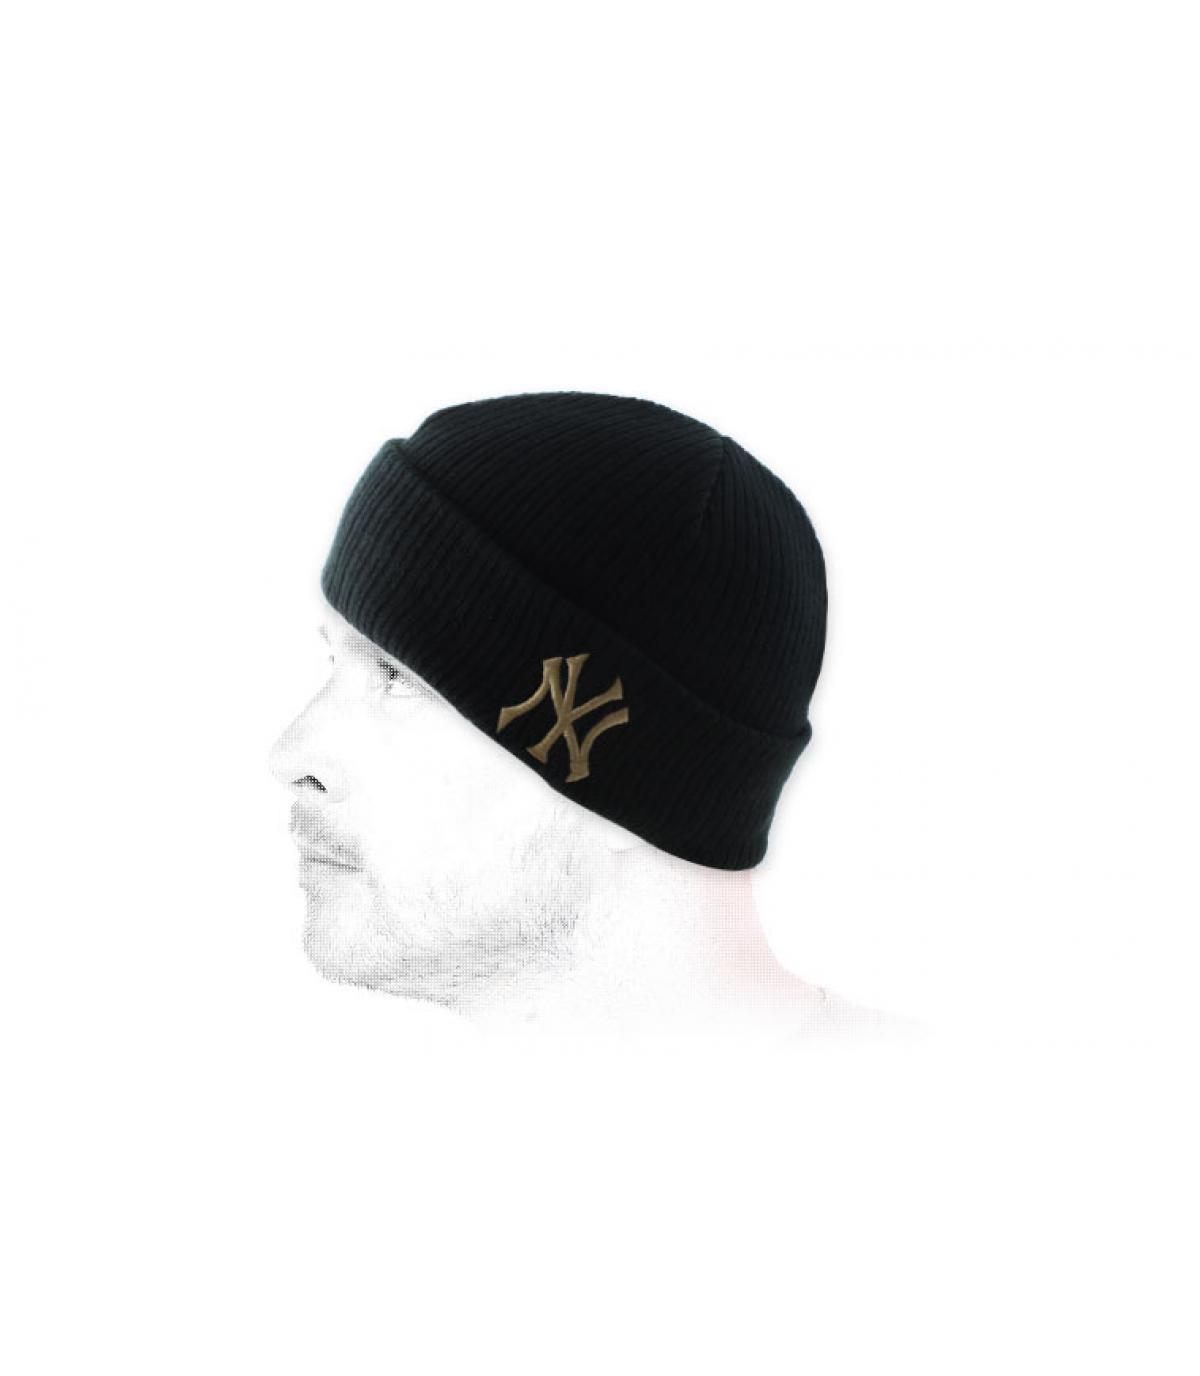 bonnet NY noir revers